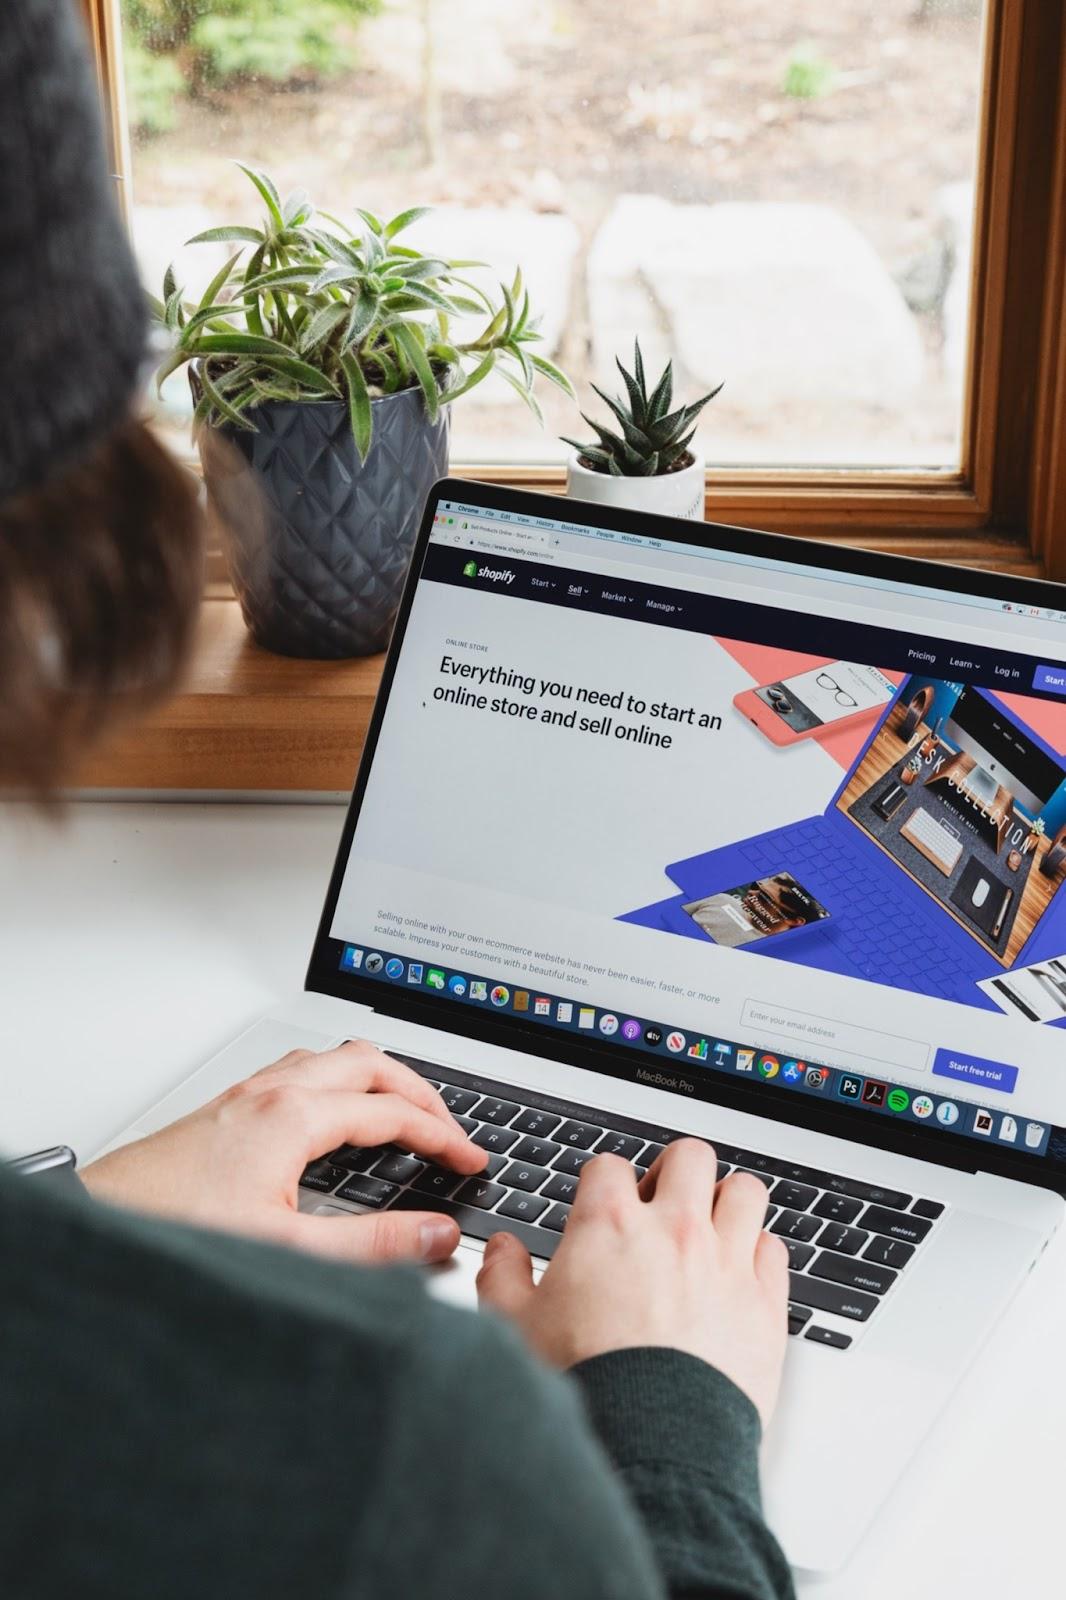 Side hustle to make money - eCommerce site